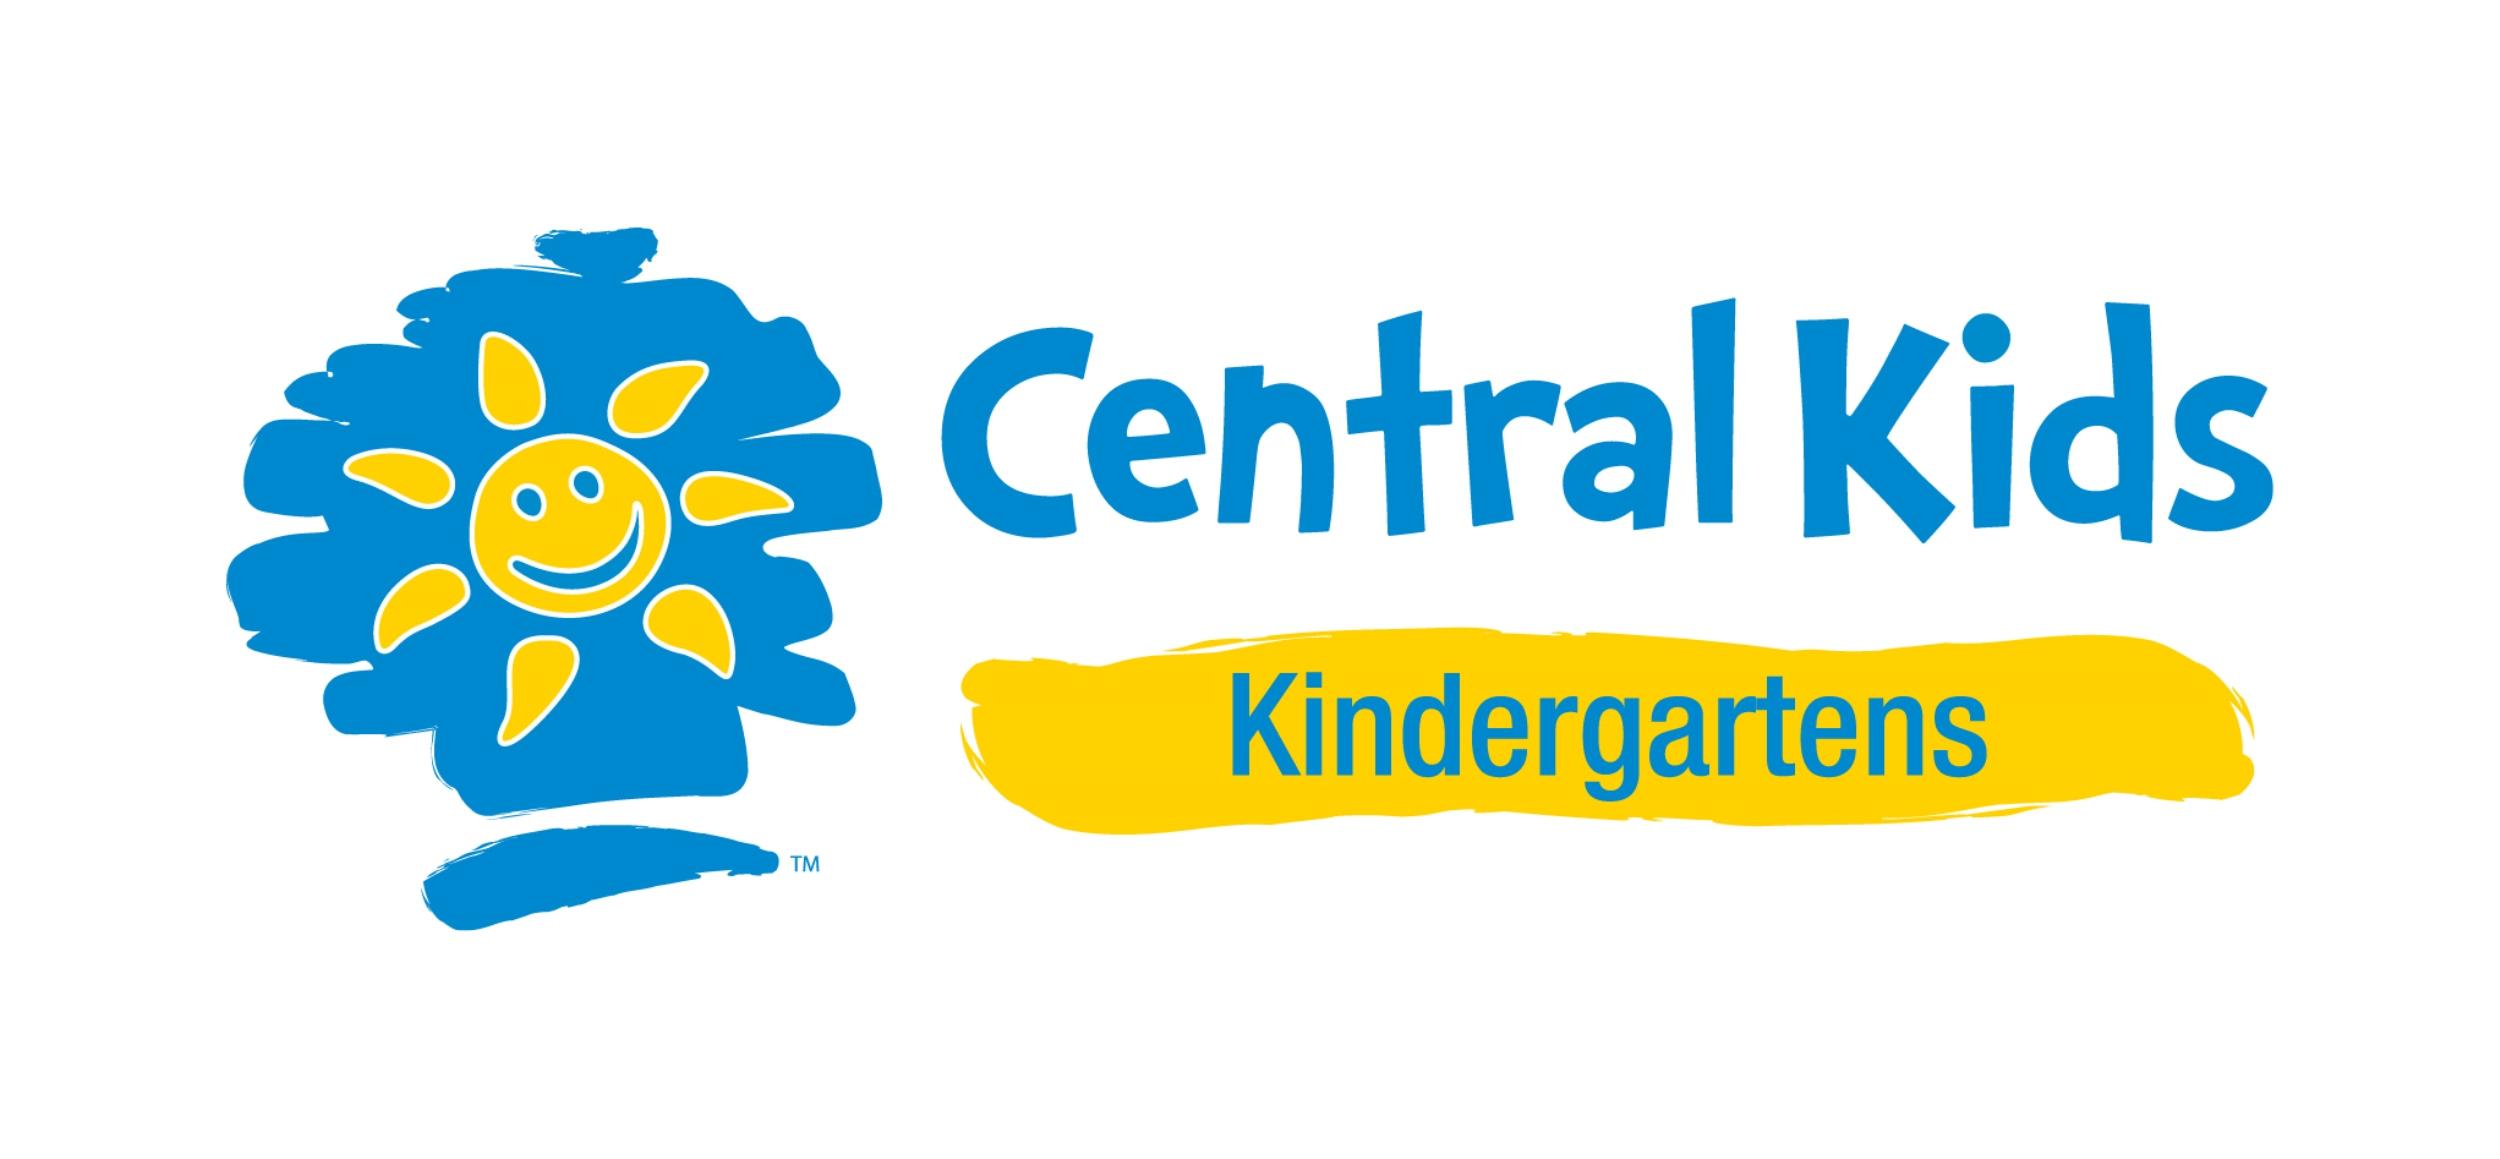 Gazette-Central-Kids-Kgtn42.jpg